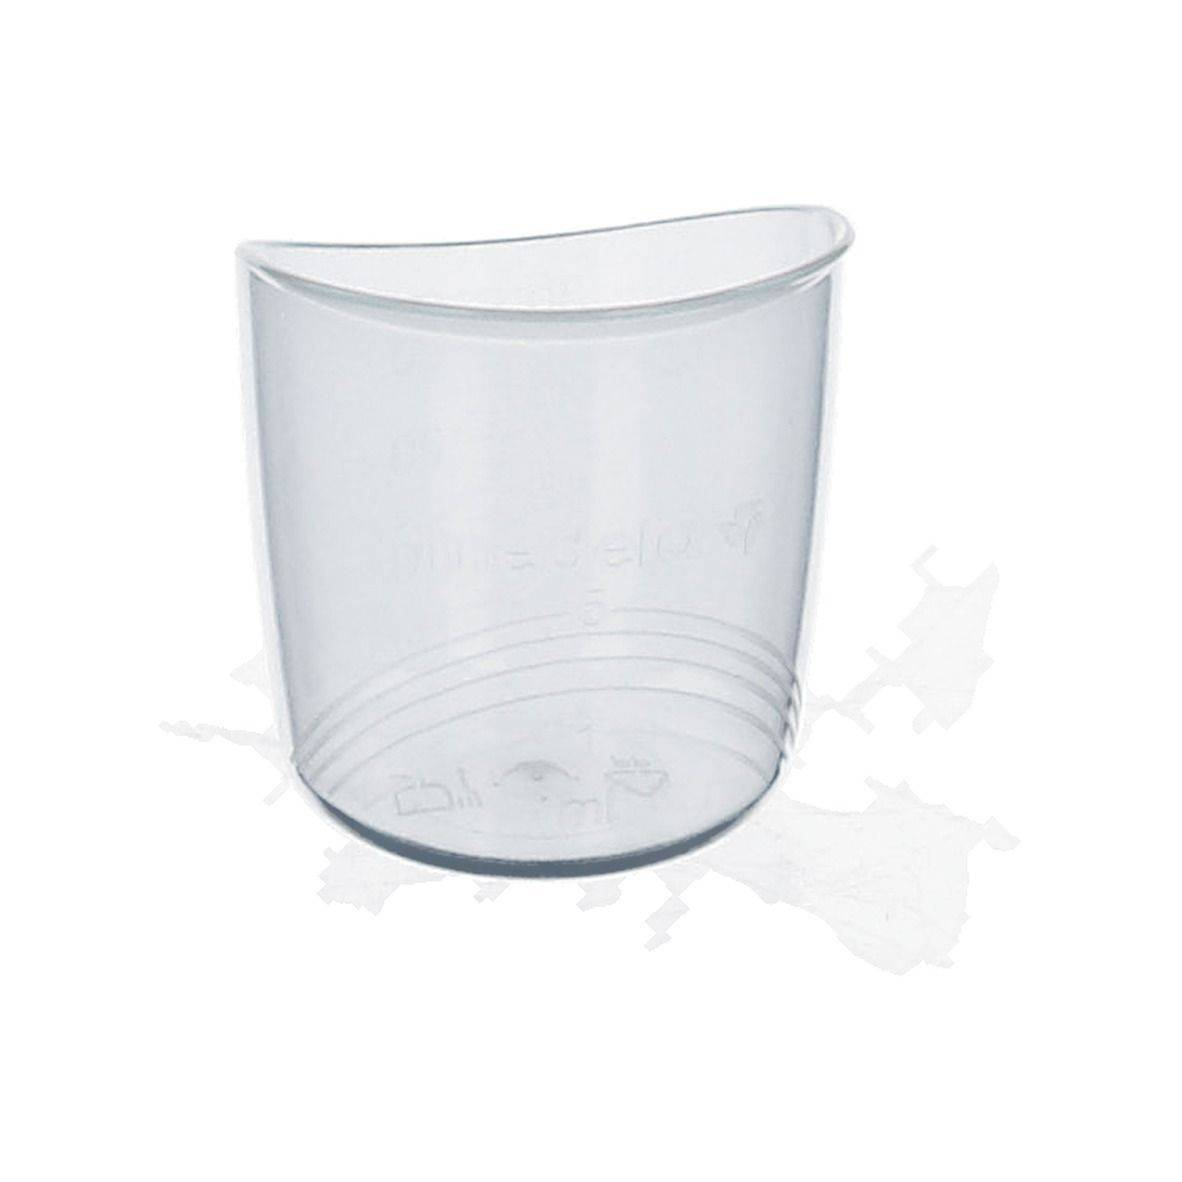 Medela Bébé Cupfeeder unidose pc(s)